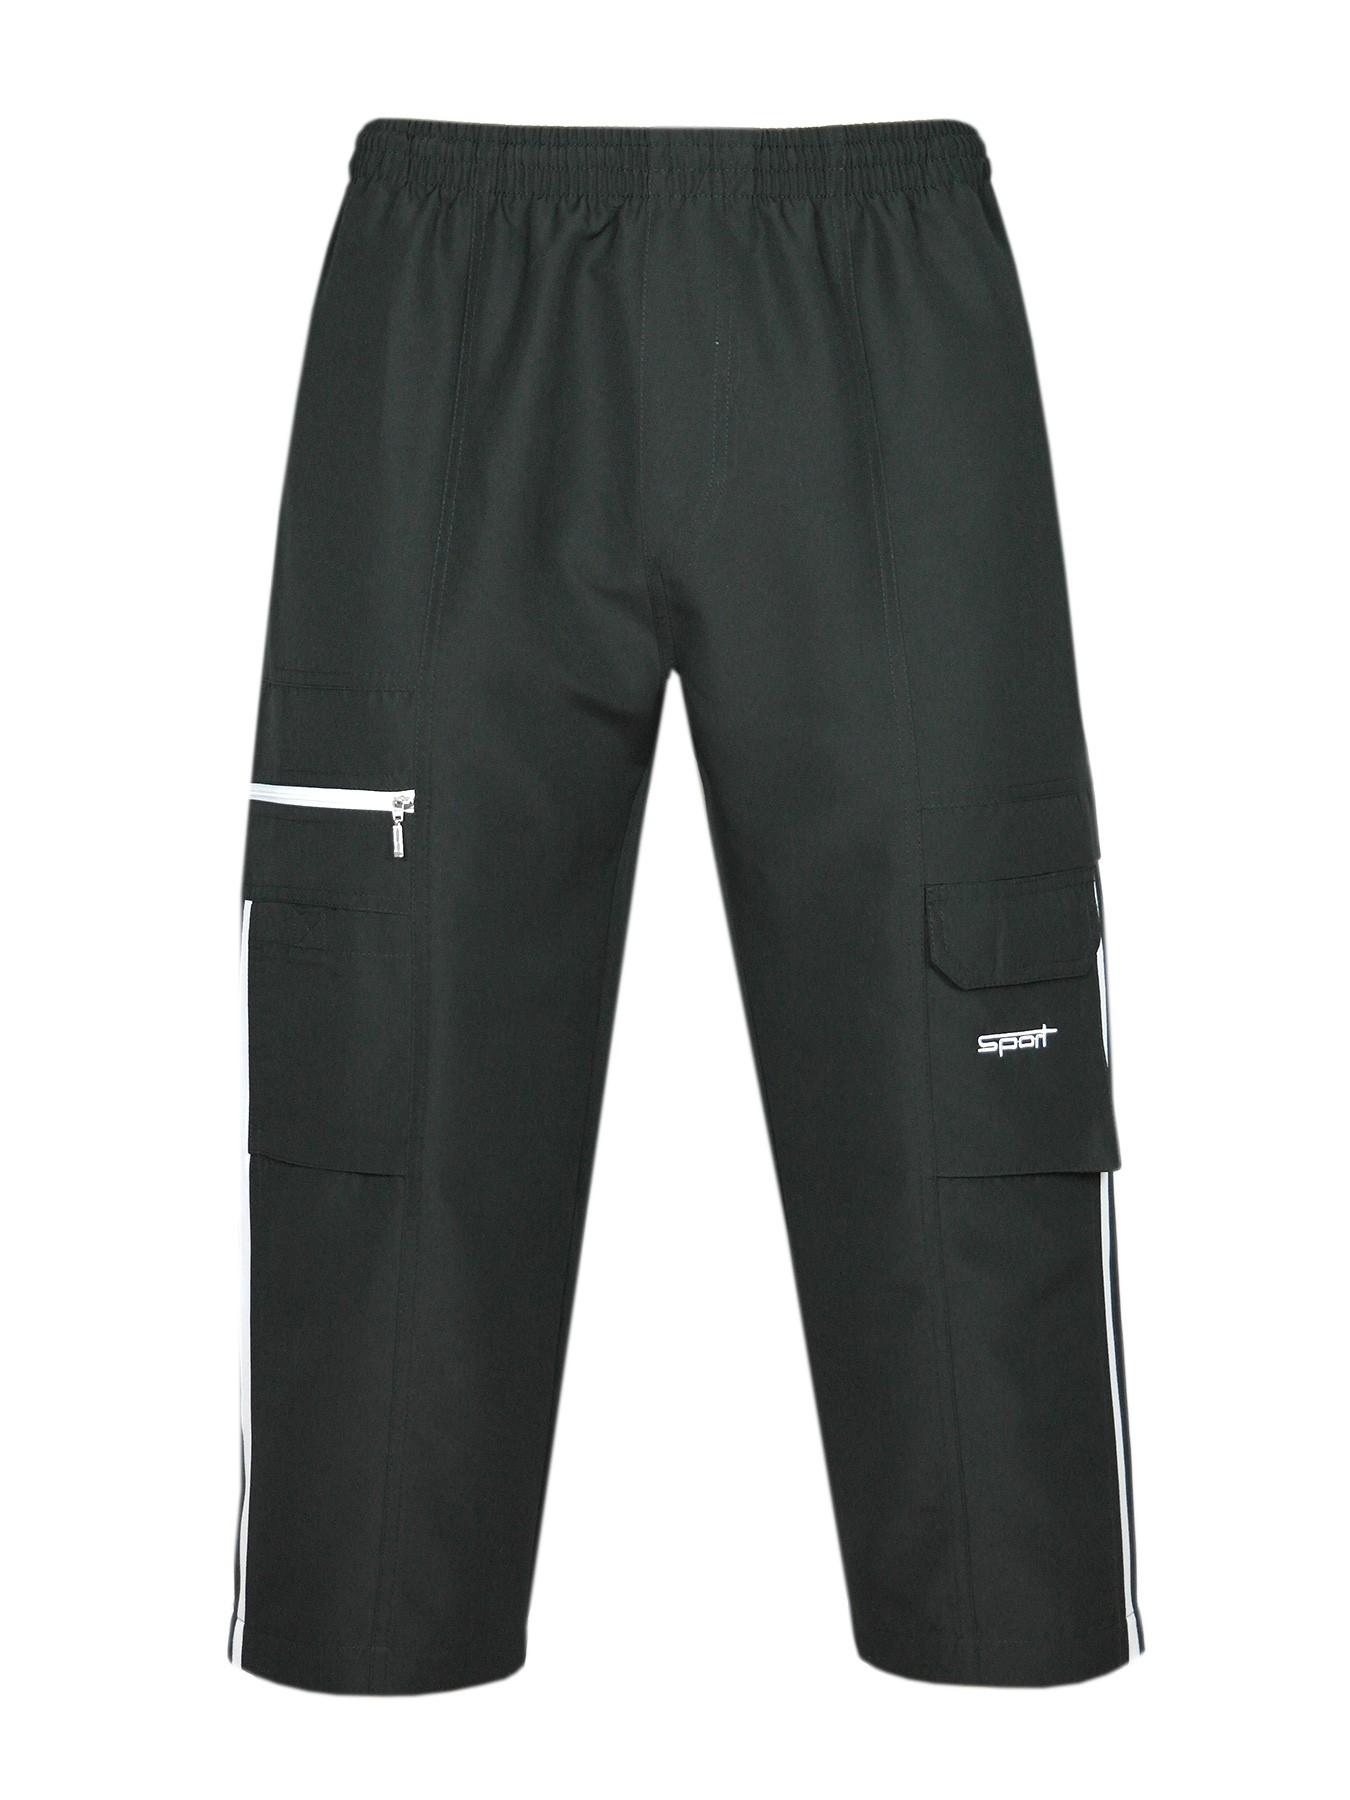 Bermuda Microfaser Shorts Dreiviertelhose Herren - Black